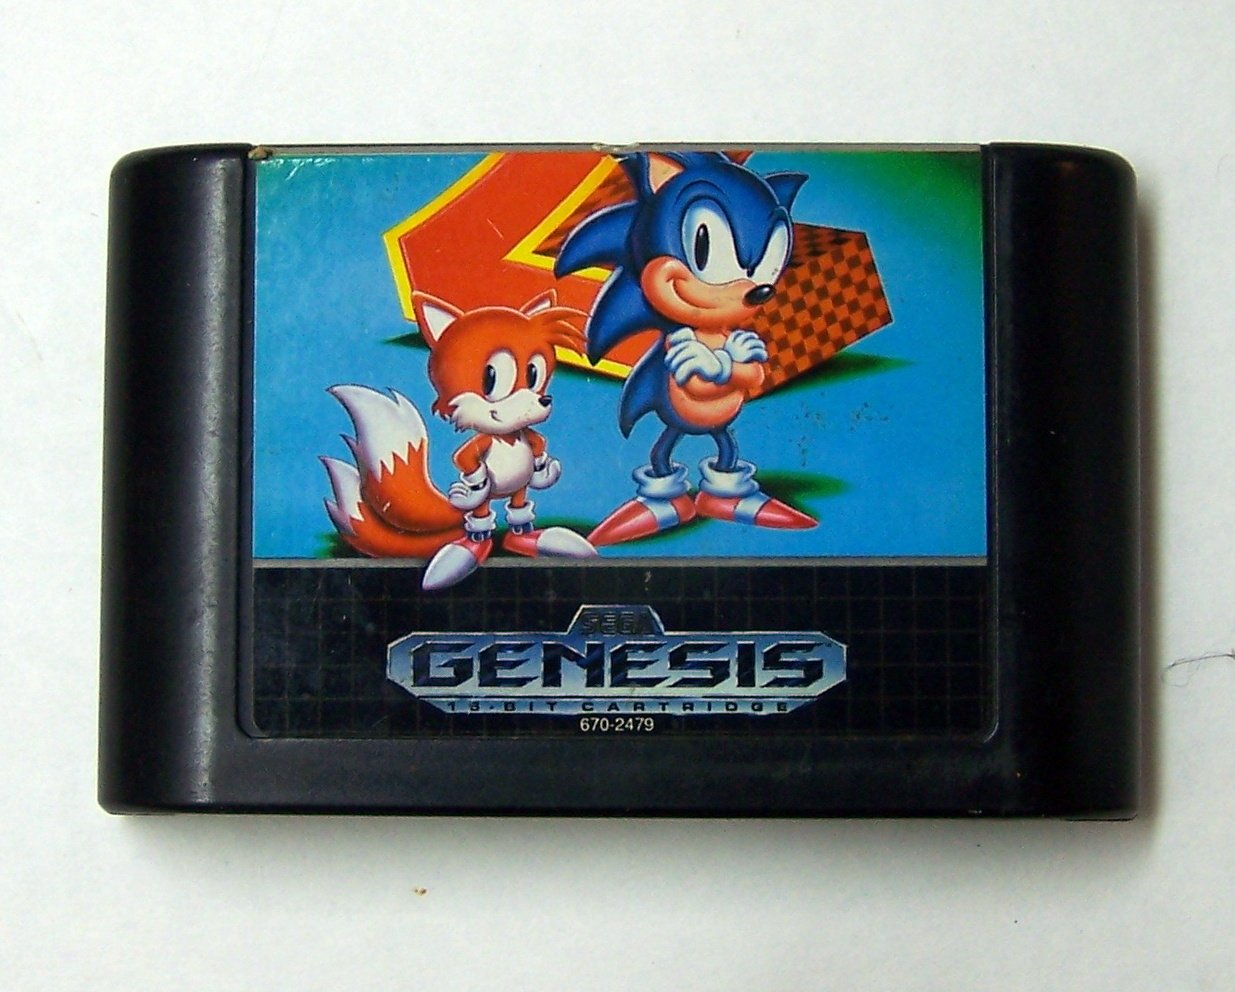 Sonic the Hedgehog 2 Sega Genesis Game